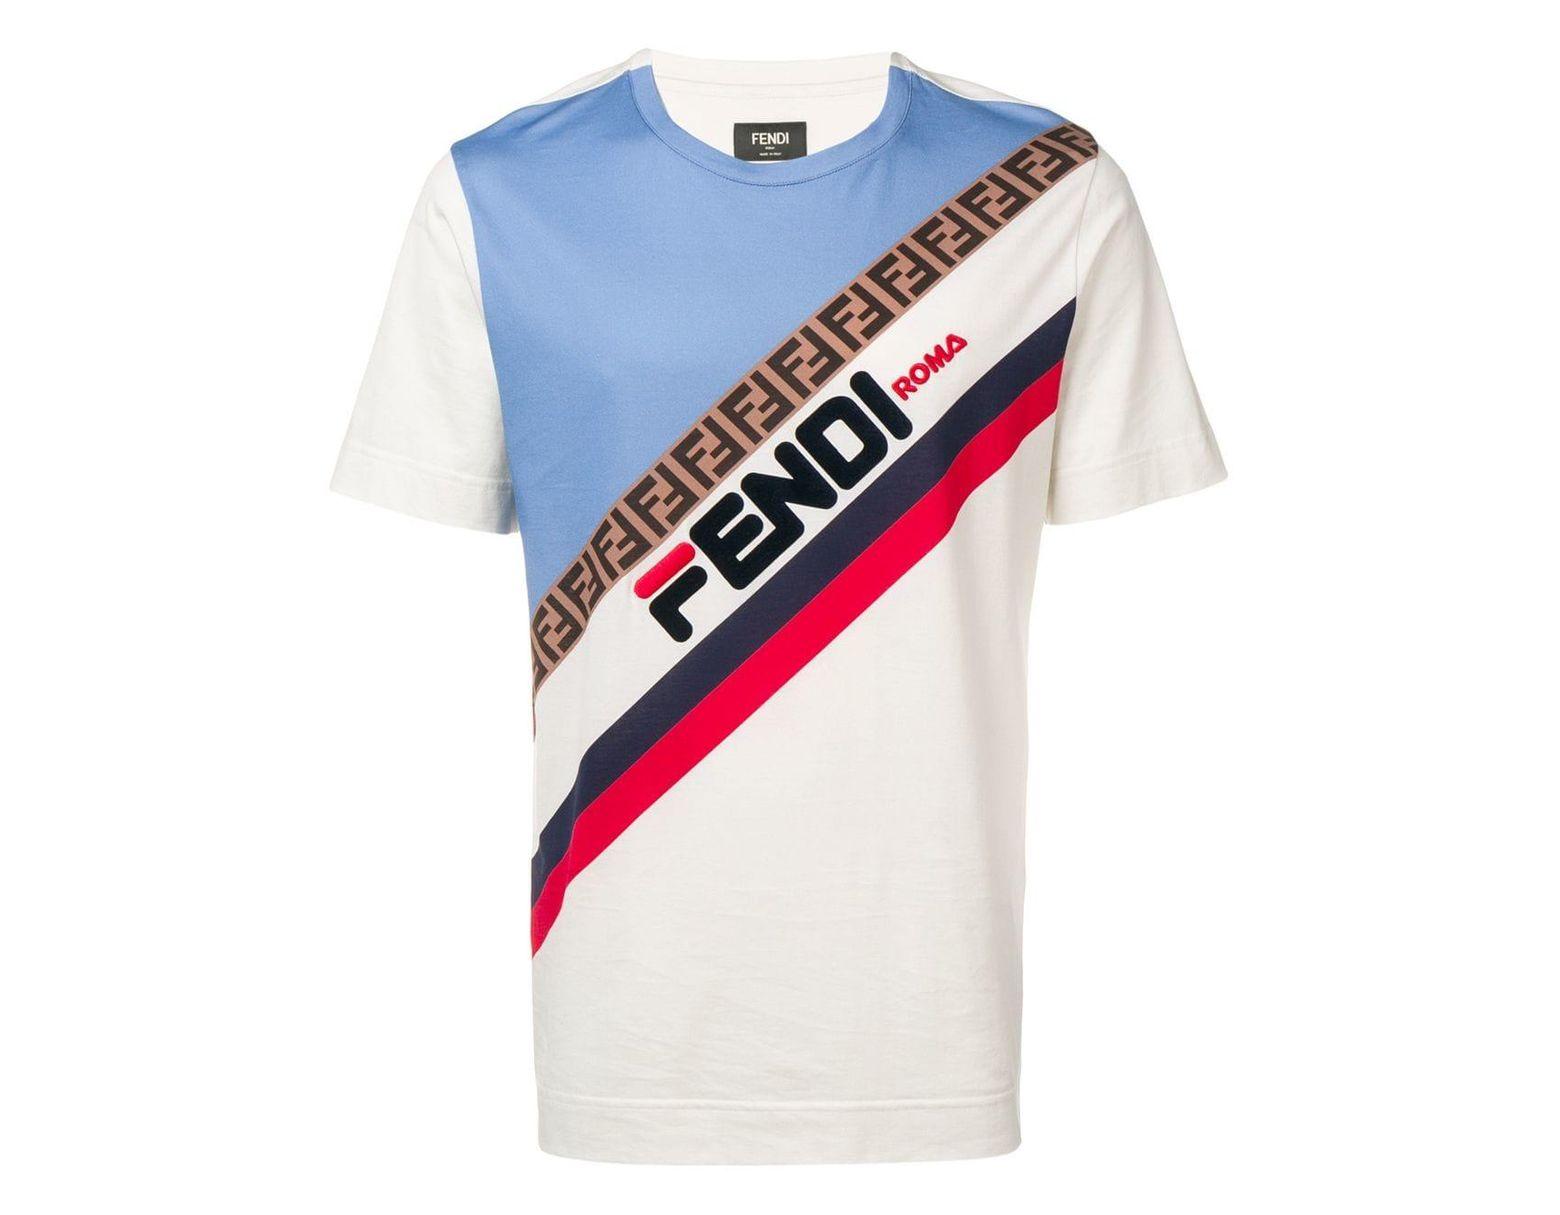 6f8da1ee7 Fendi Logo Print T-shirt for Men - Save 33% - Lyst